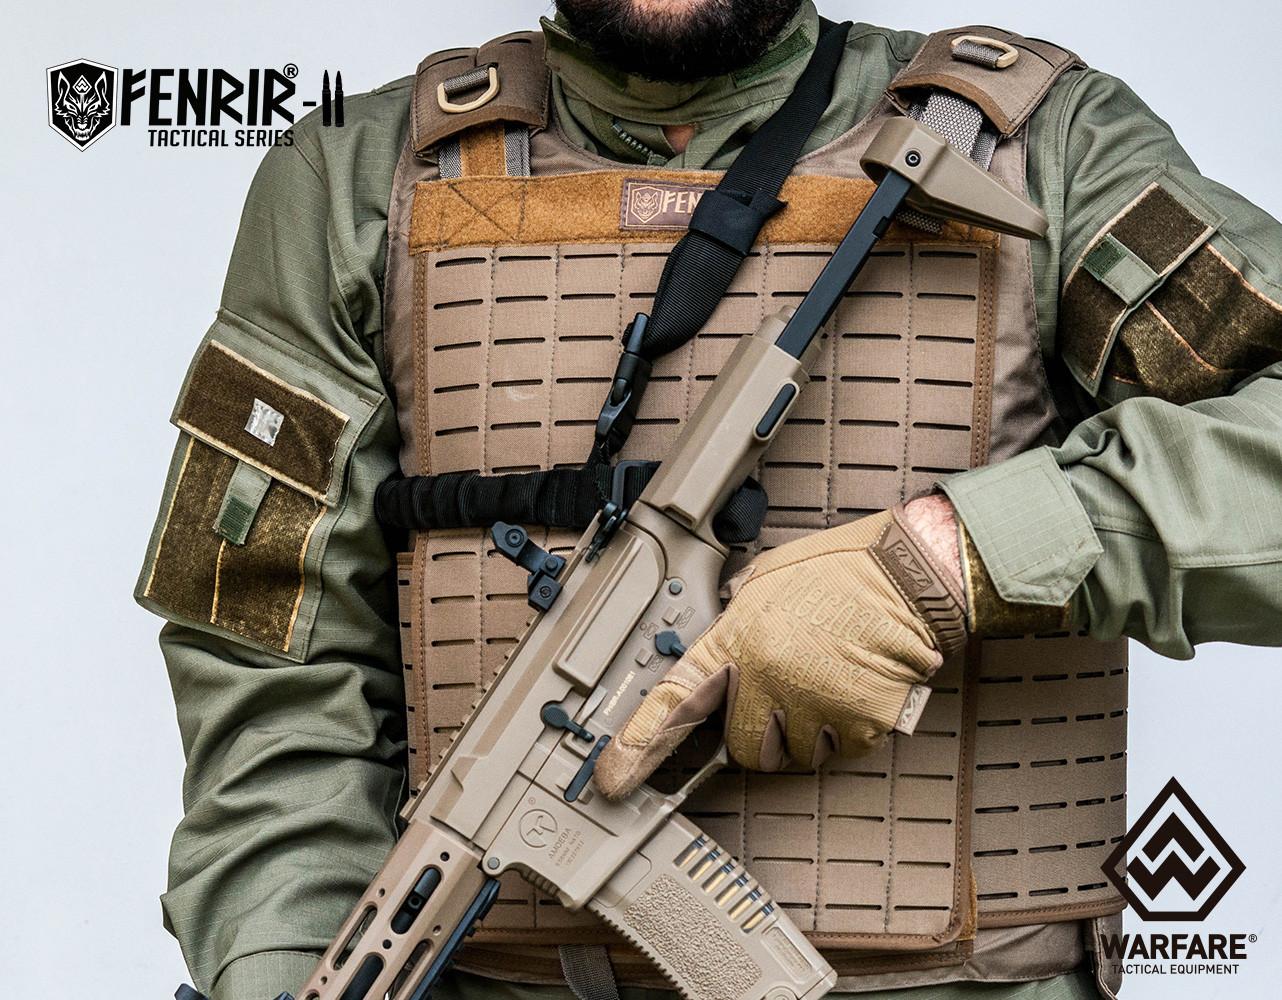 Novo design colete Fenrir II